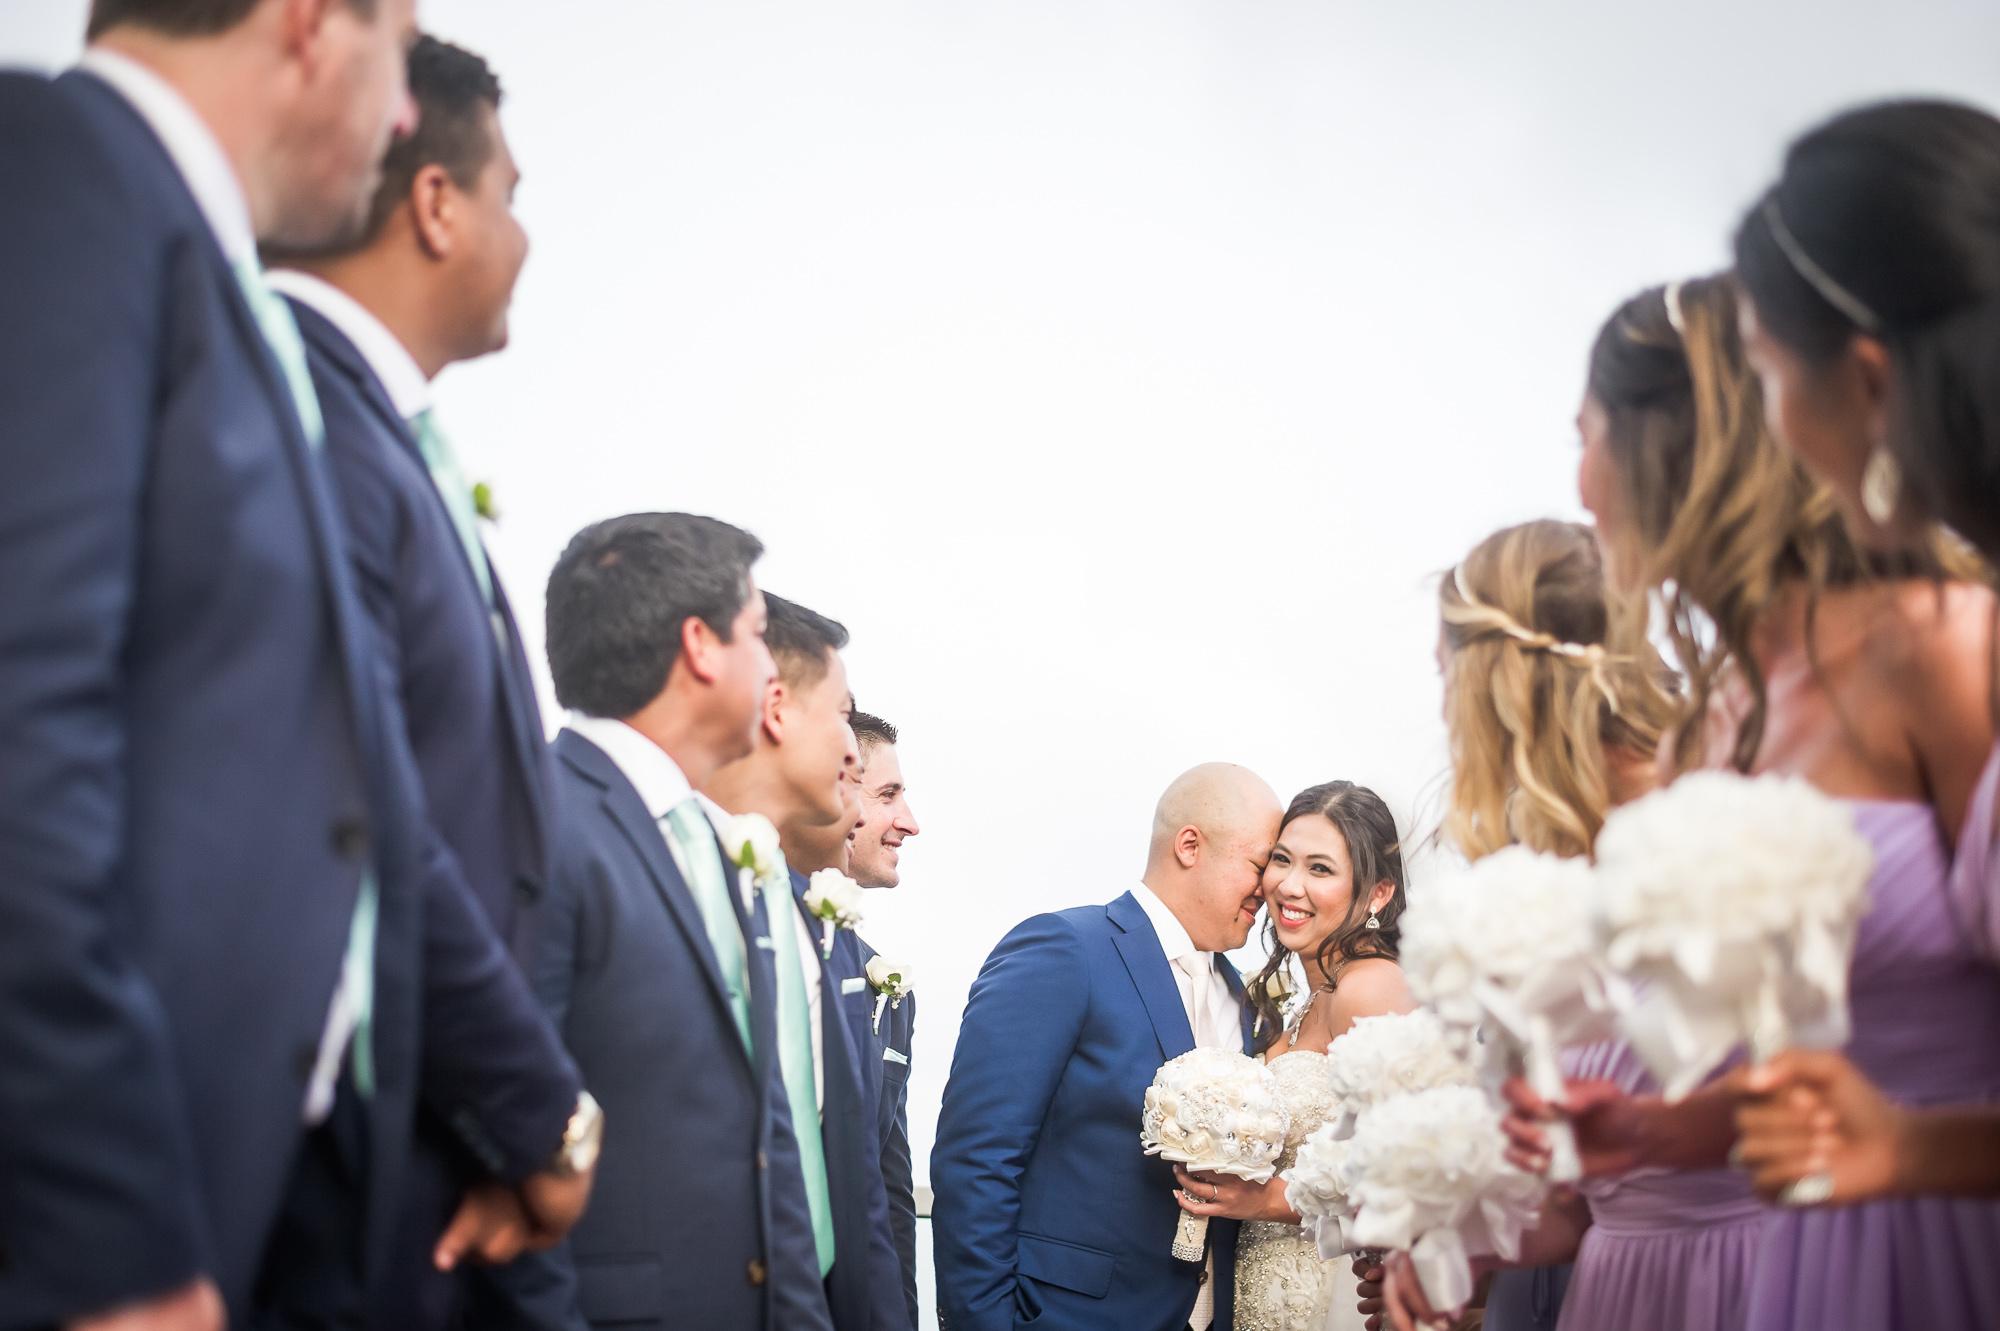 32-David Loi Studios - Cancun - Mexico - Destination Wedding-25759.jpg